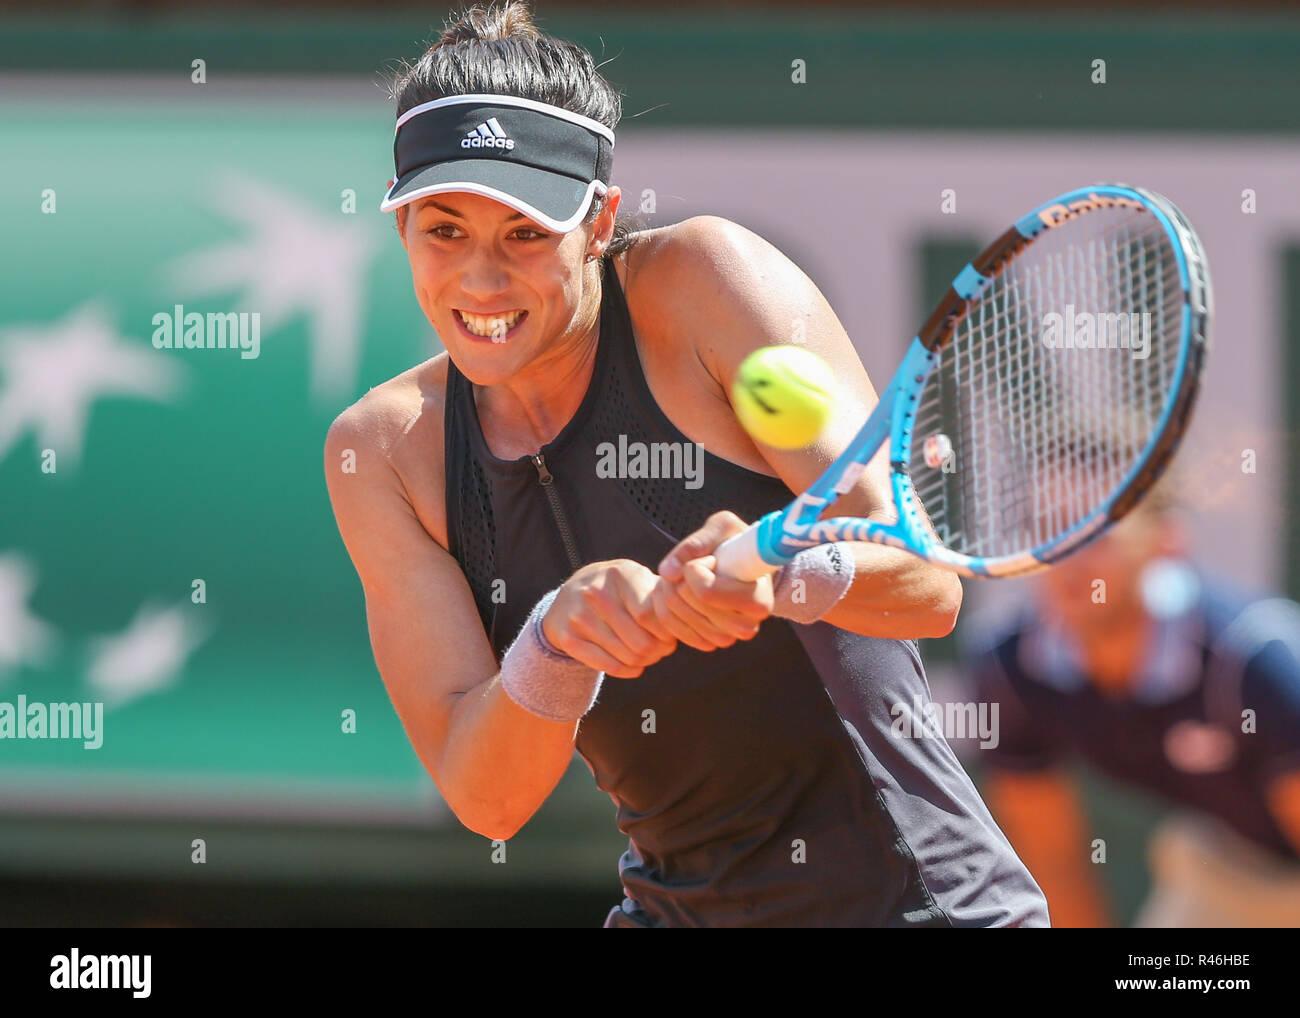 Spanish tennis player Garbine Muguruza playing backhand shot at the  French Open 2018, Paris, France - Stock Image